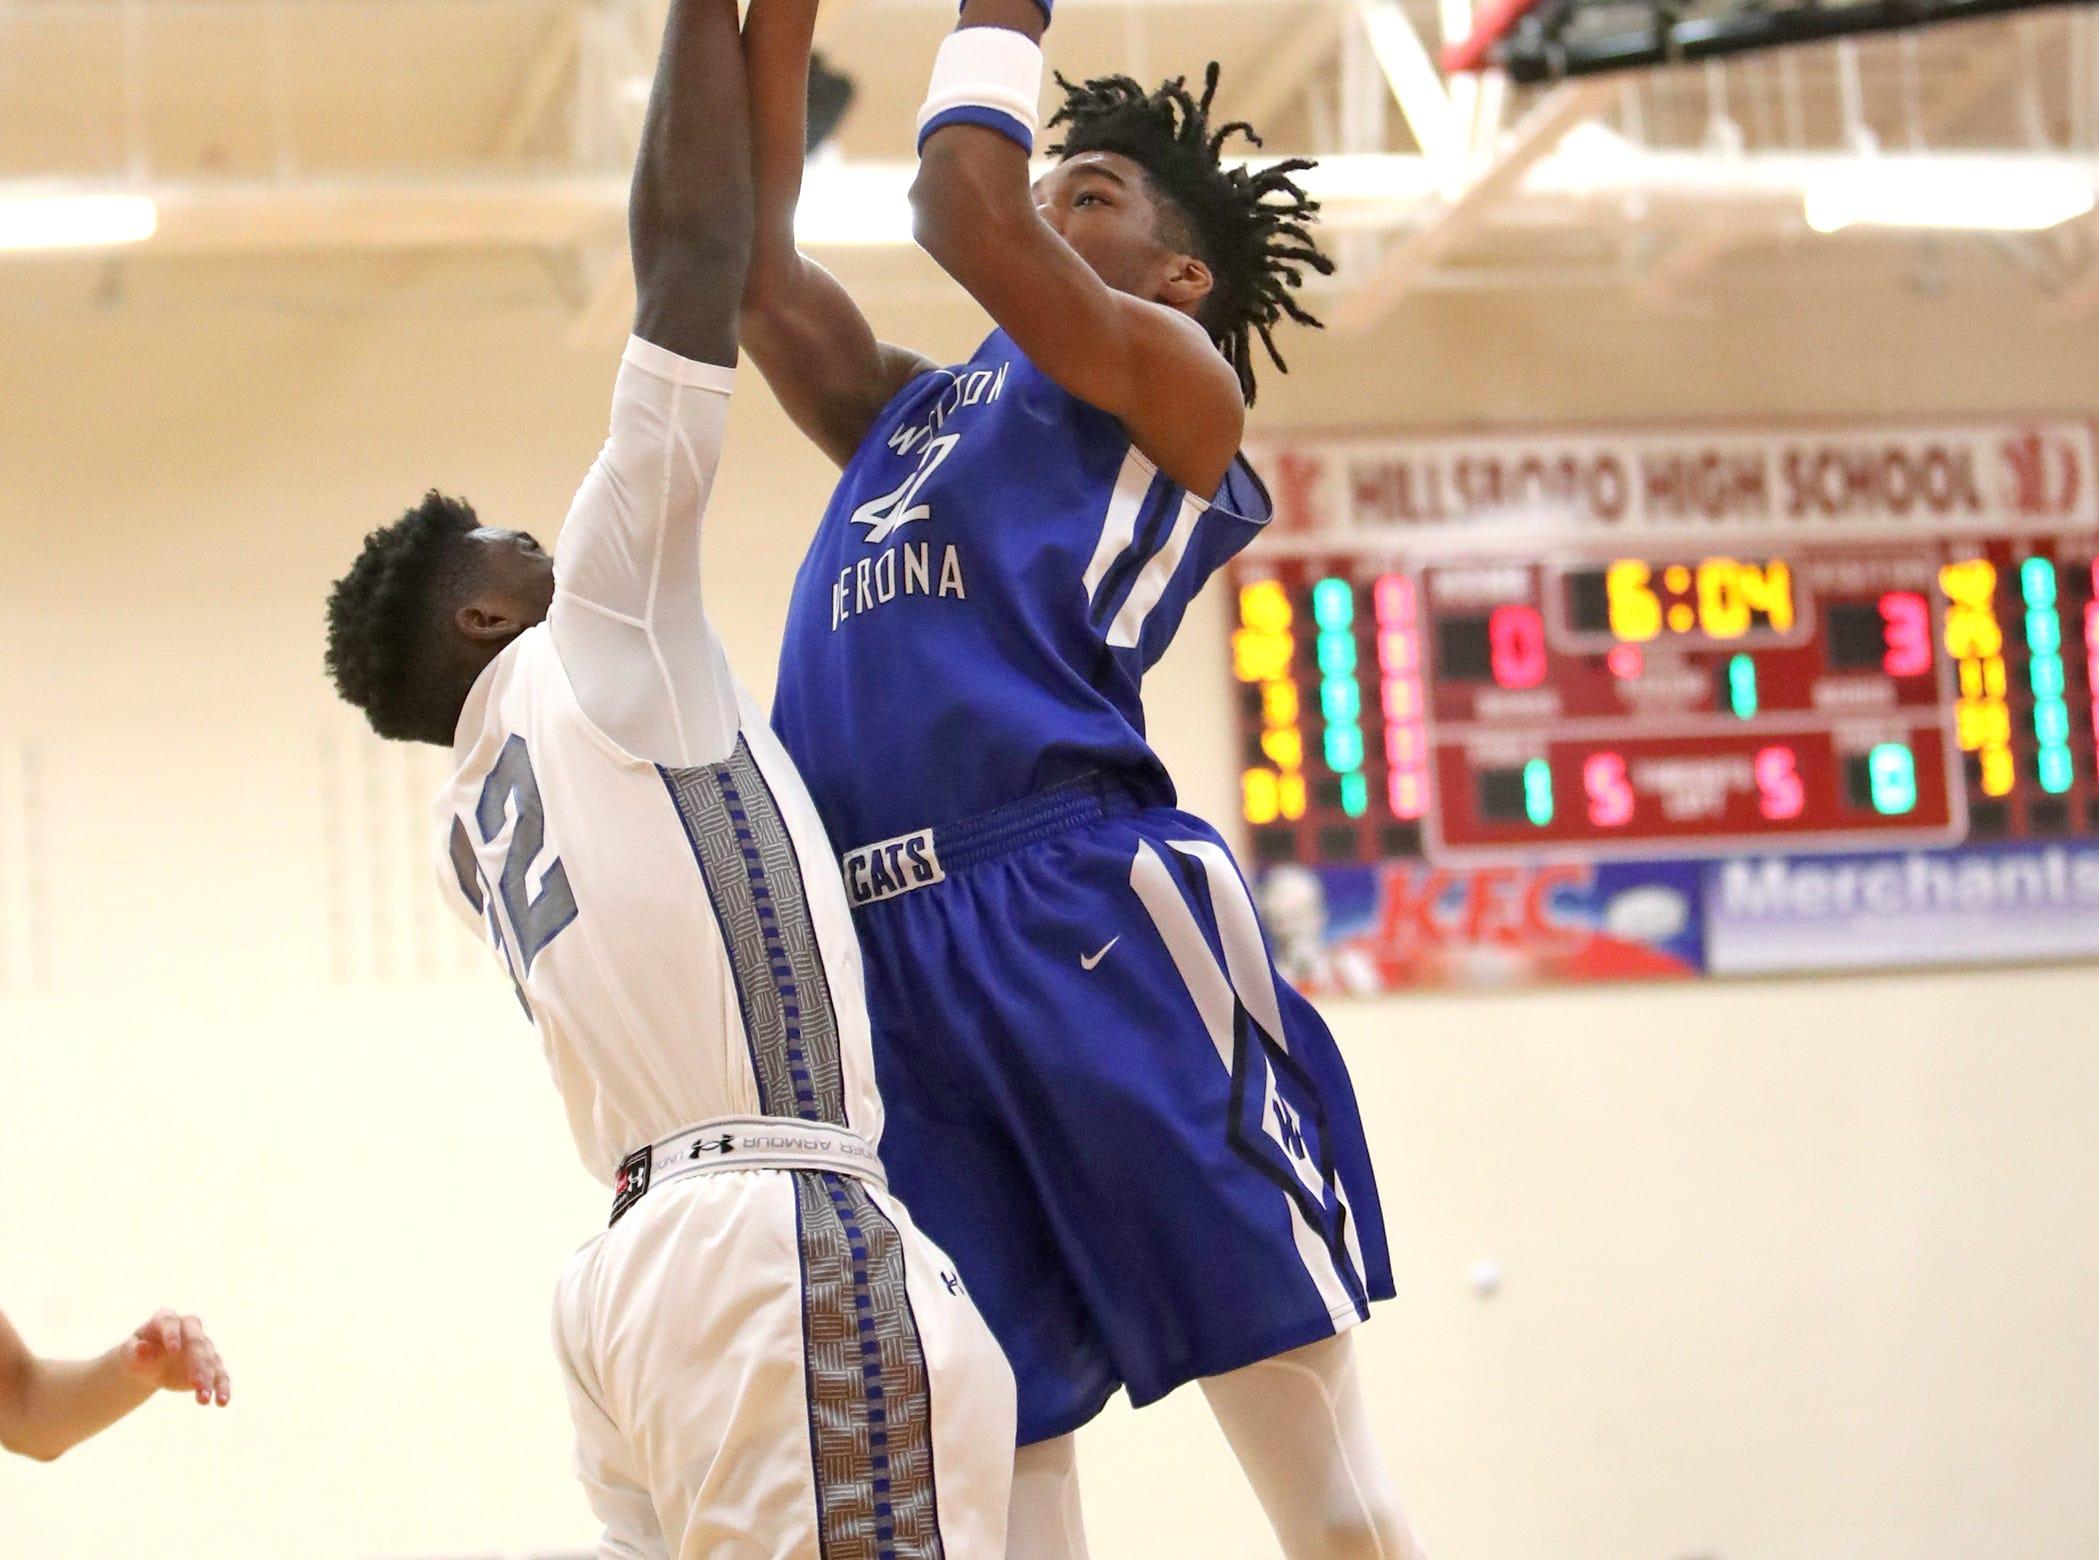 Walton Verona center Dieonte Miles attacks the basket at the Ohio Valley Hoops Classic at Hillsboro High School. Walton Verona defeated Xenia 62-54.